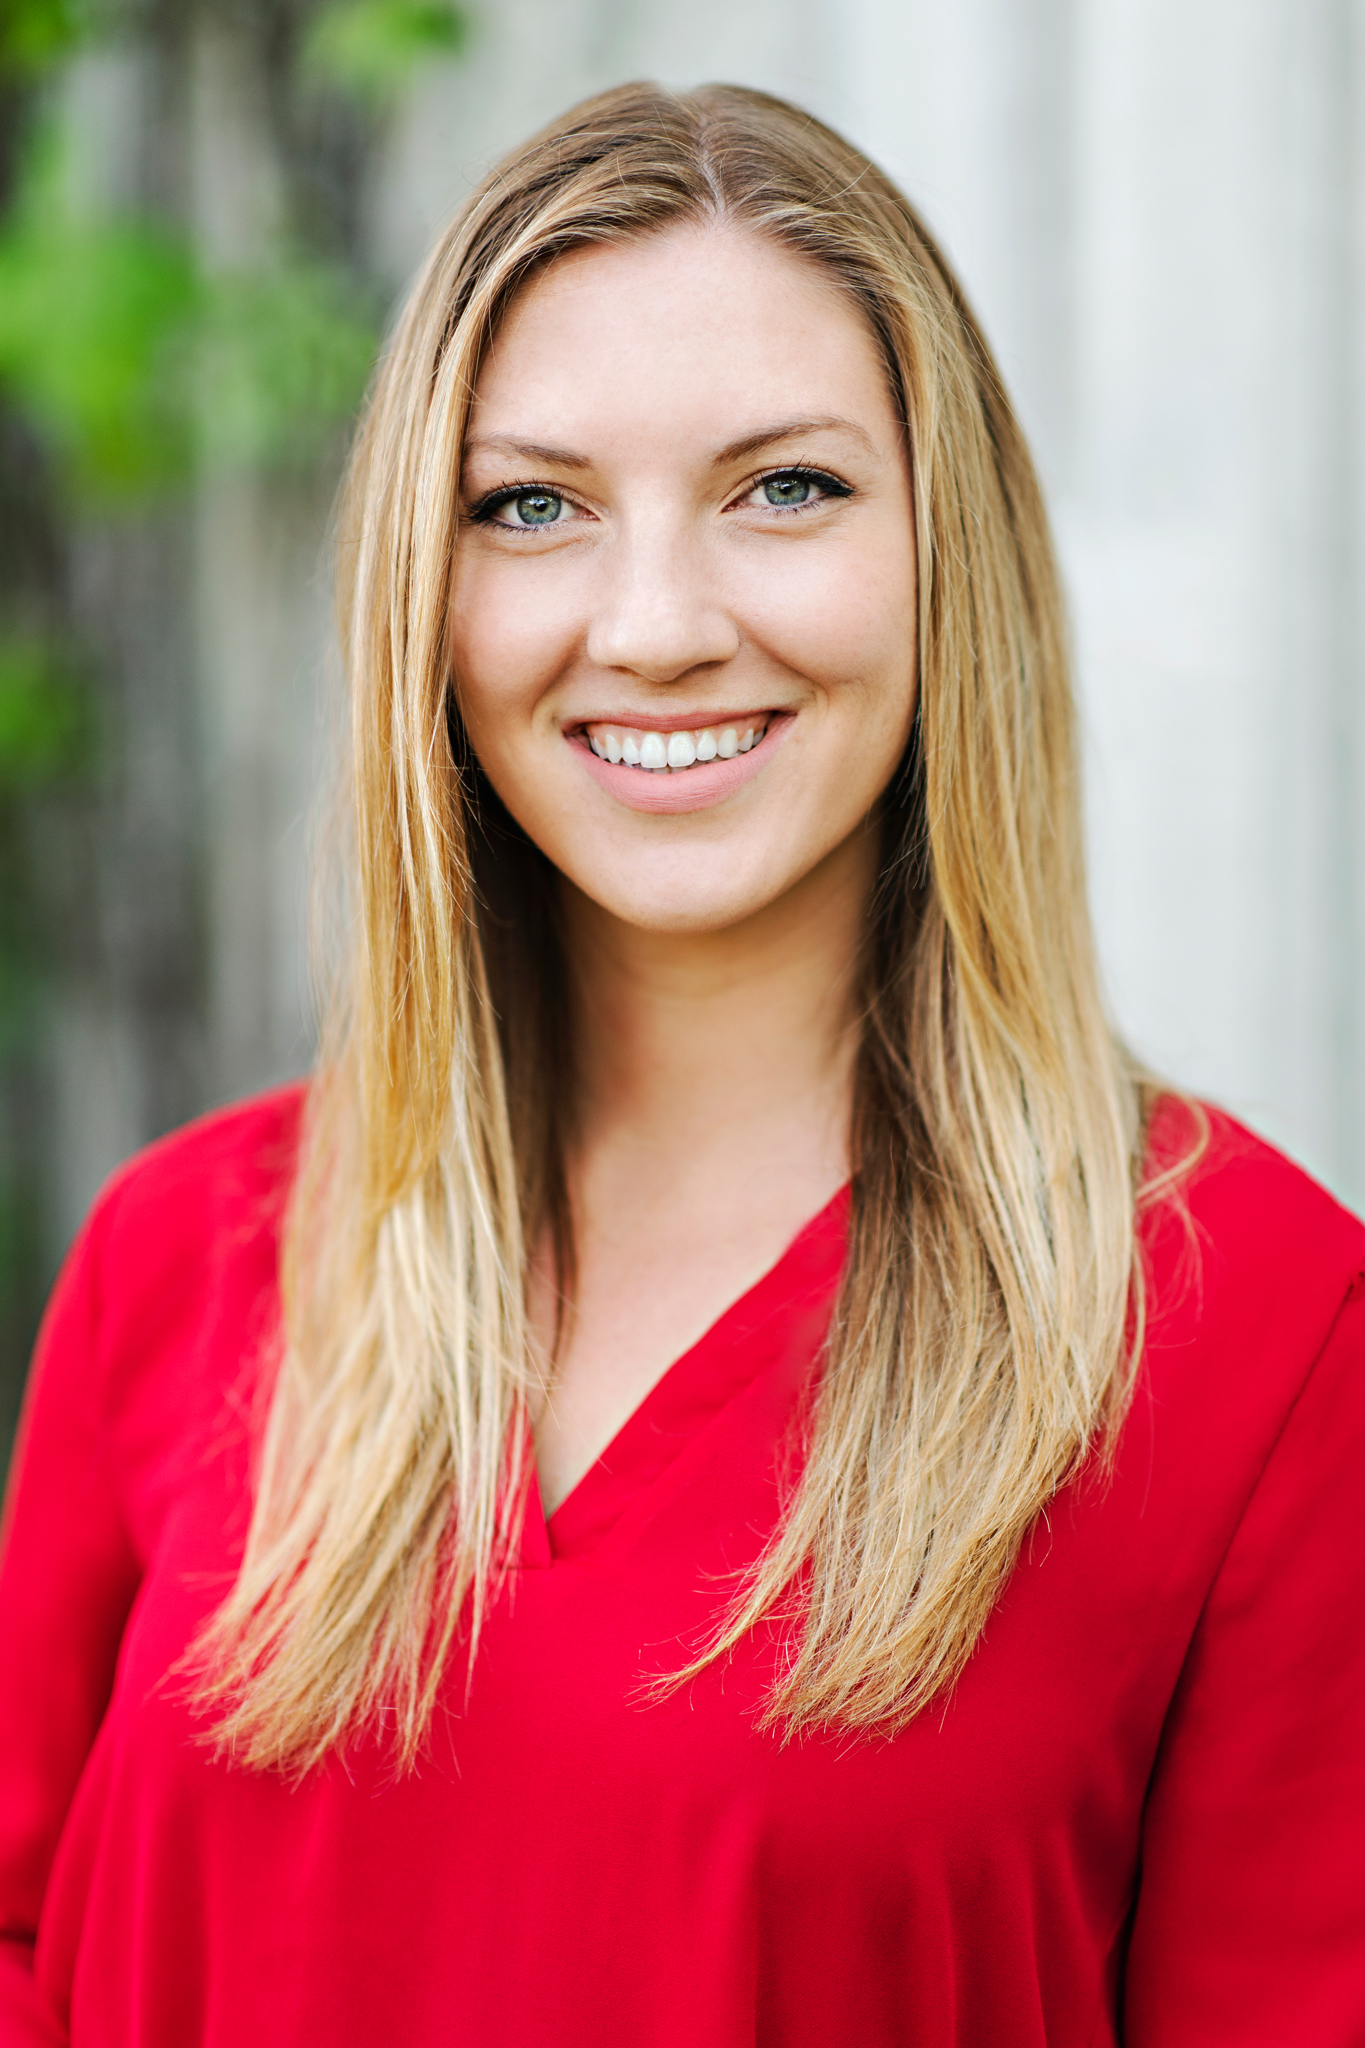 Jenna McGonegal